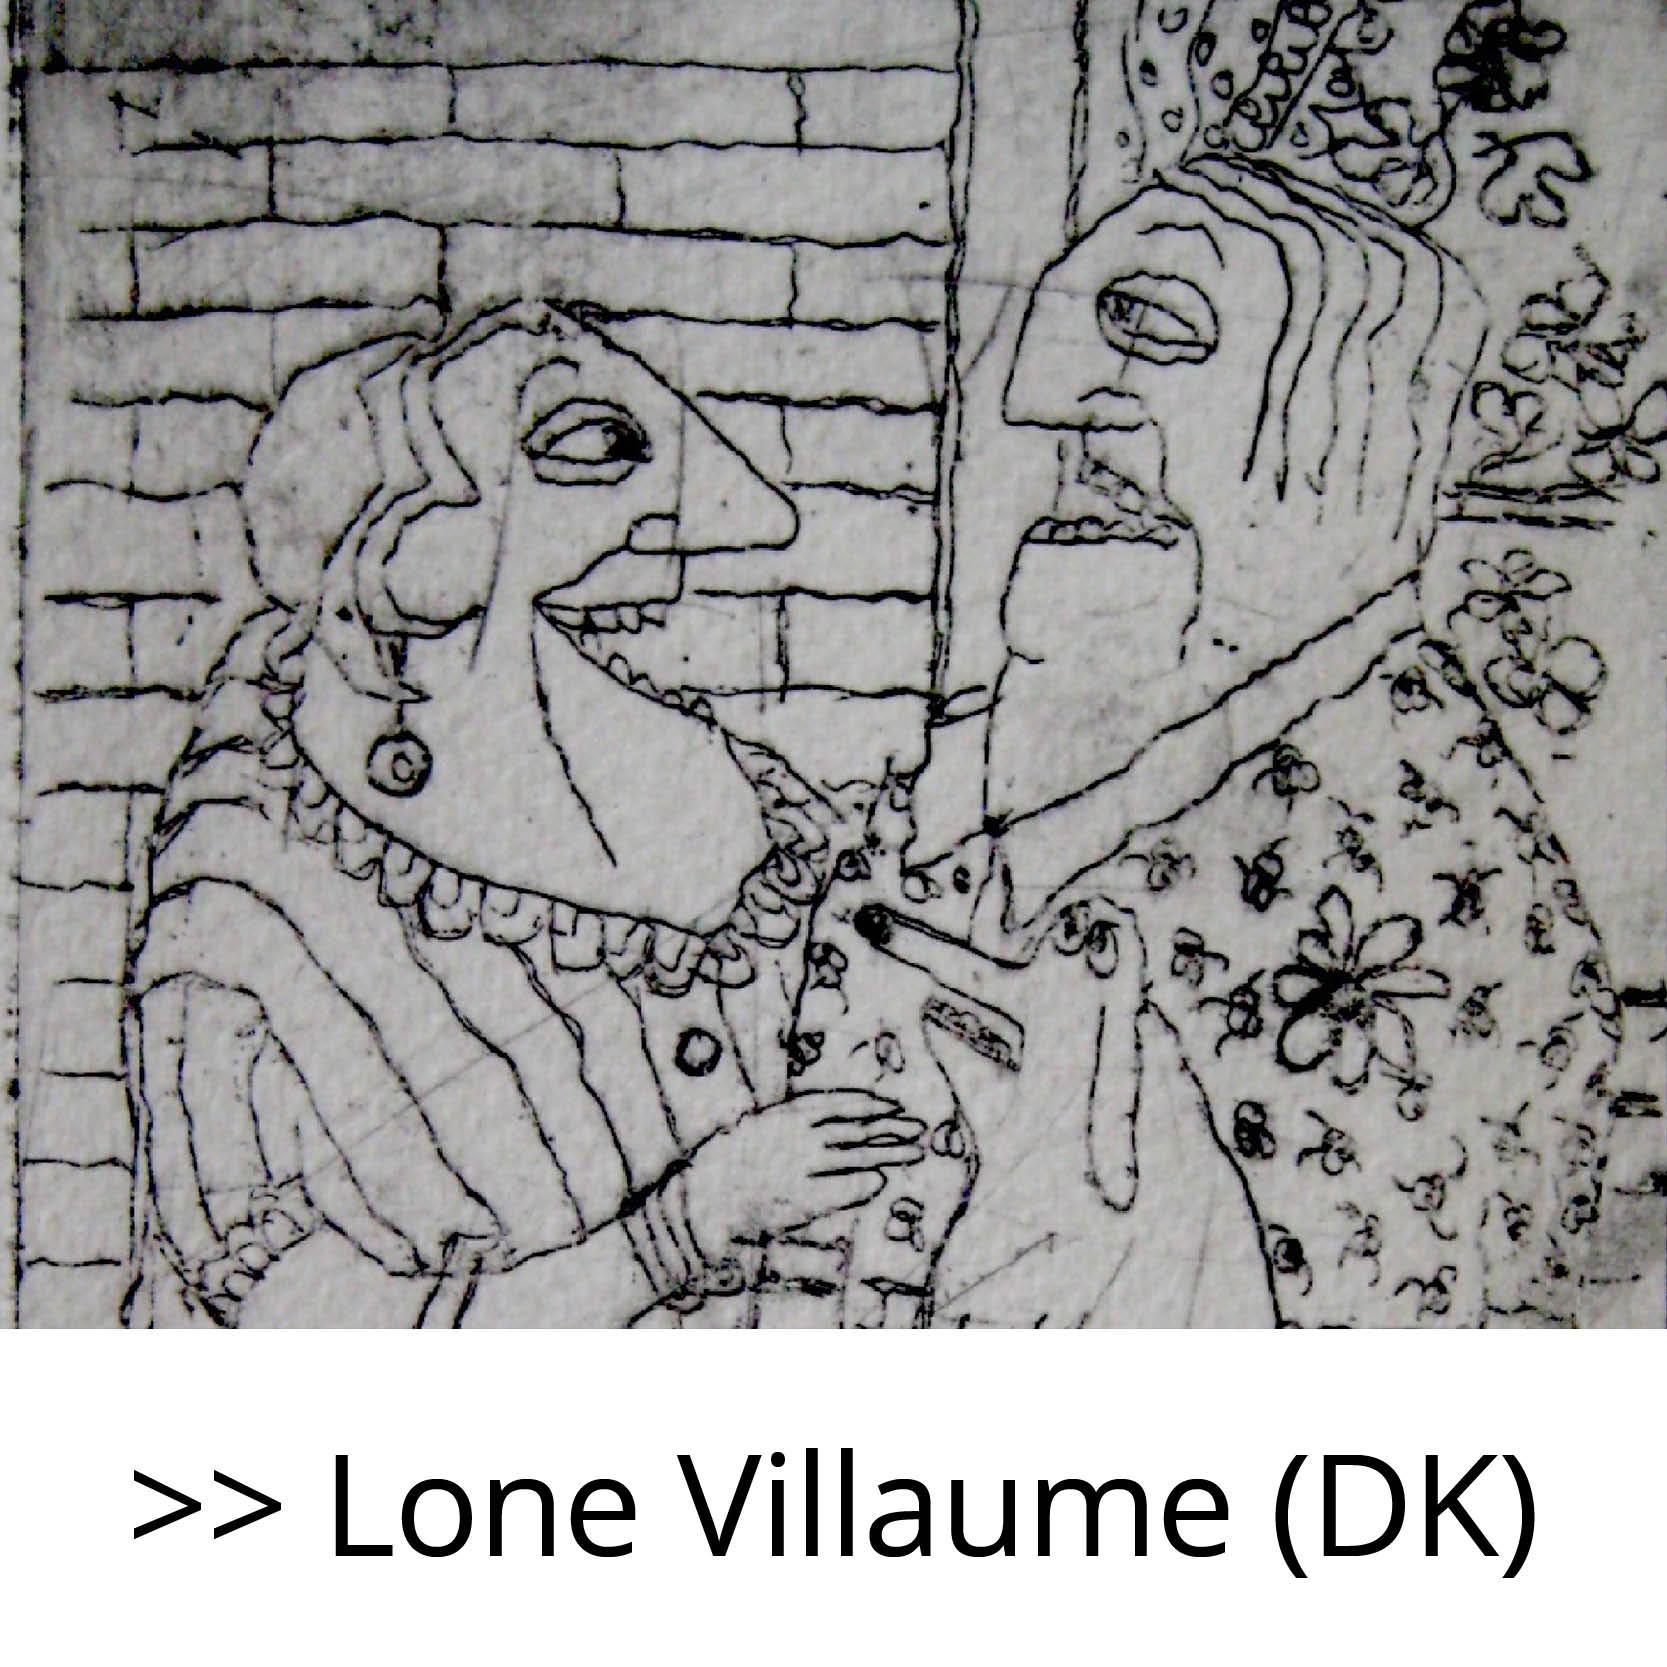 Lone_ Villaume_(DK)